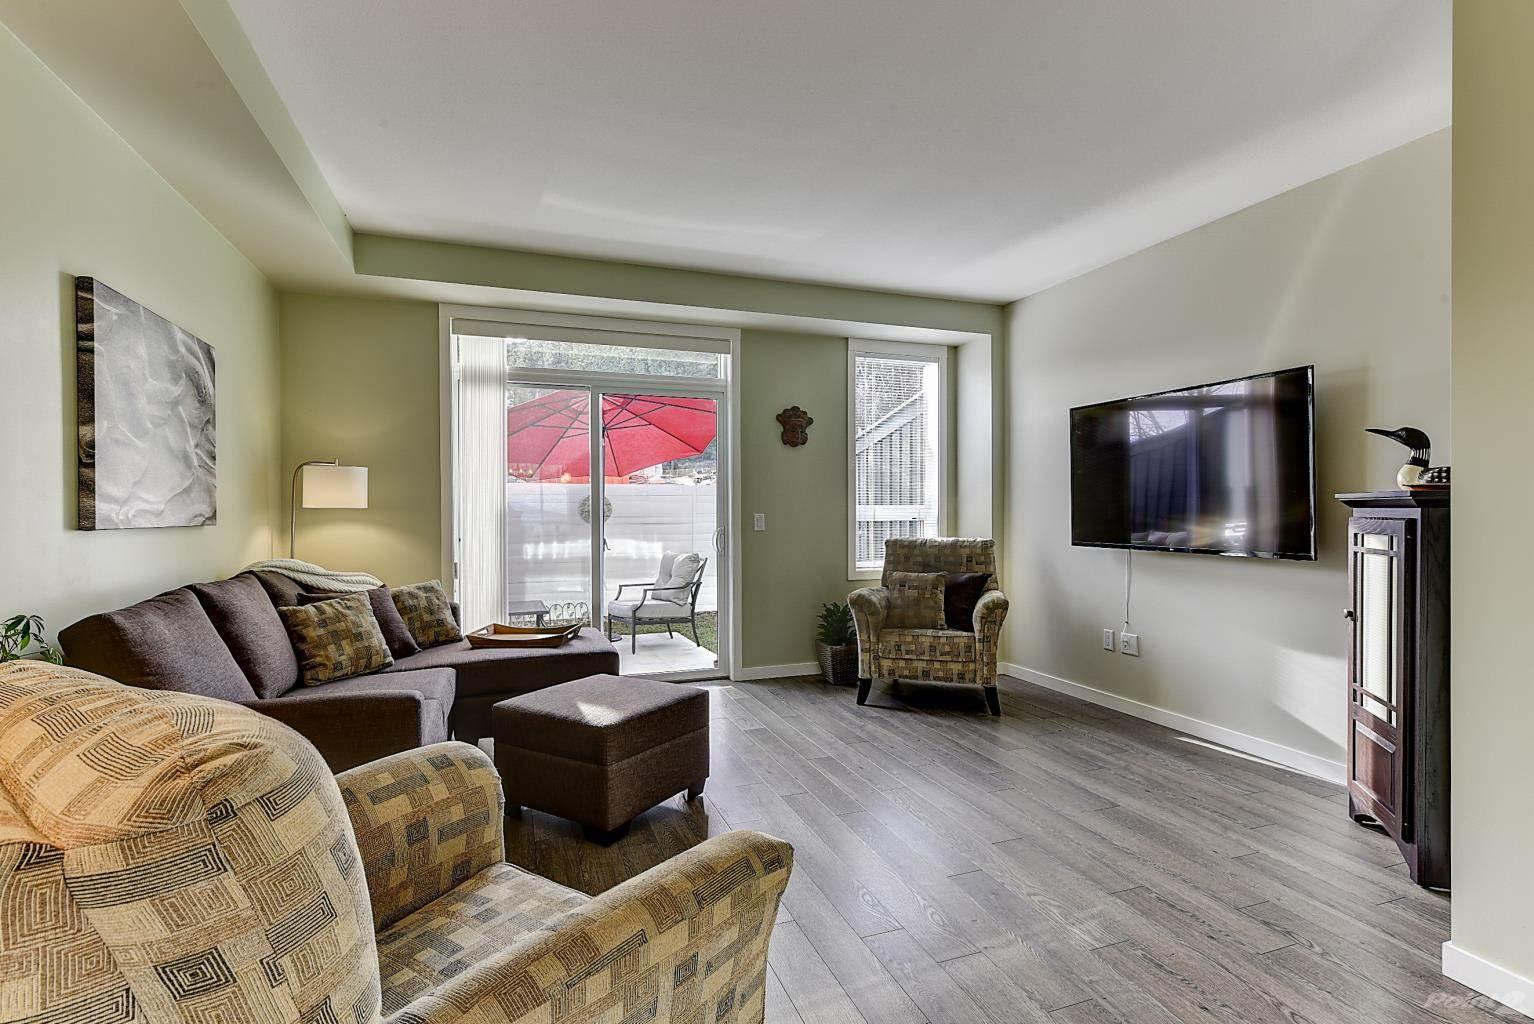 625 Boynton Place in Kelowna - Multifamily For Sale : MLS# 10221871 Photo 14